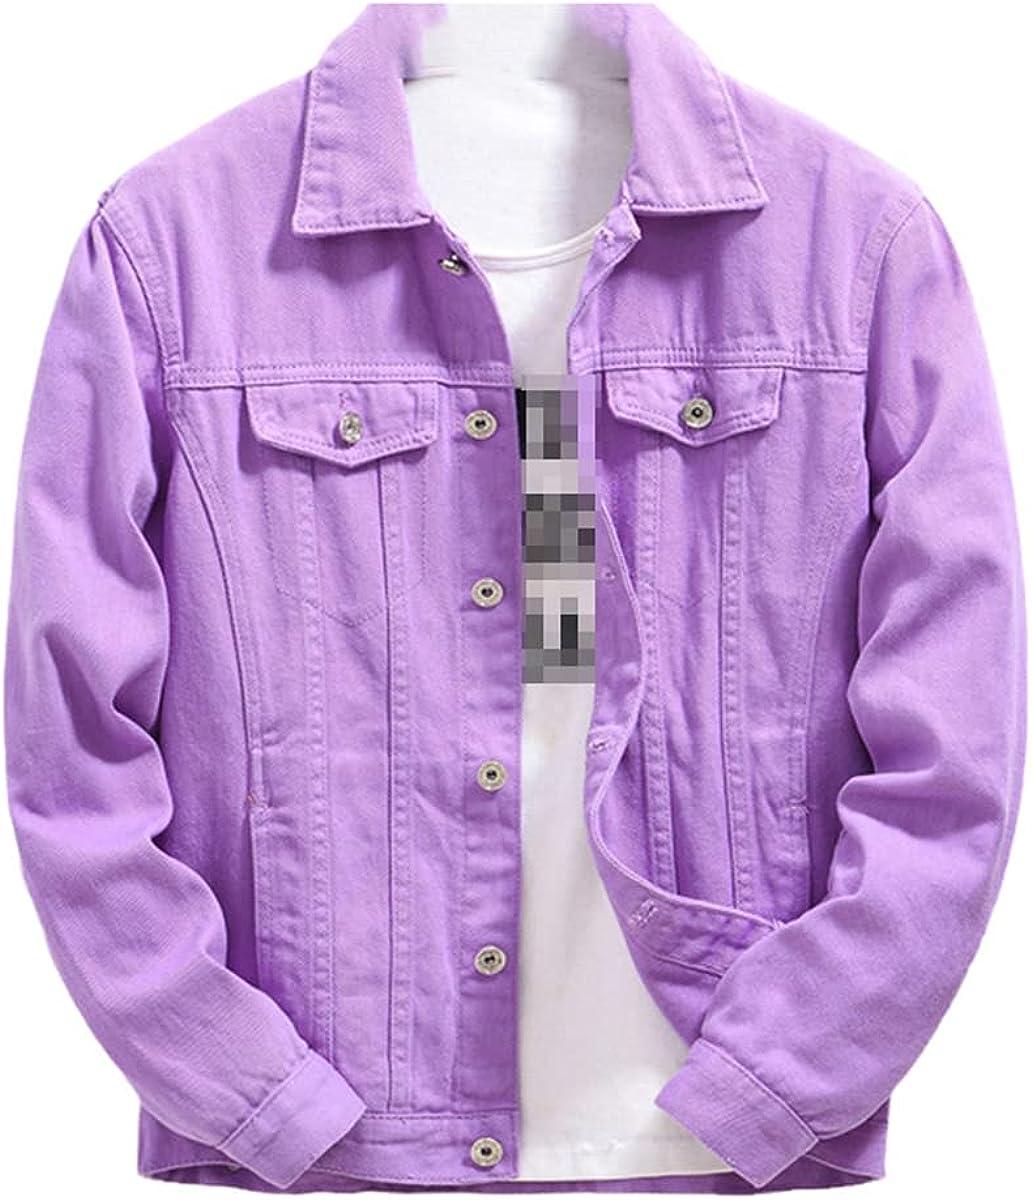 Slim Men's Jackets And Coats Casual Vest Jeans Jackets